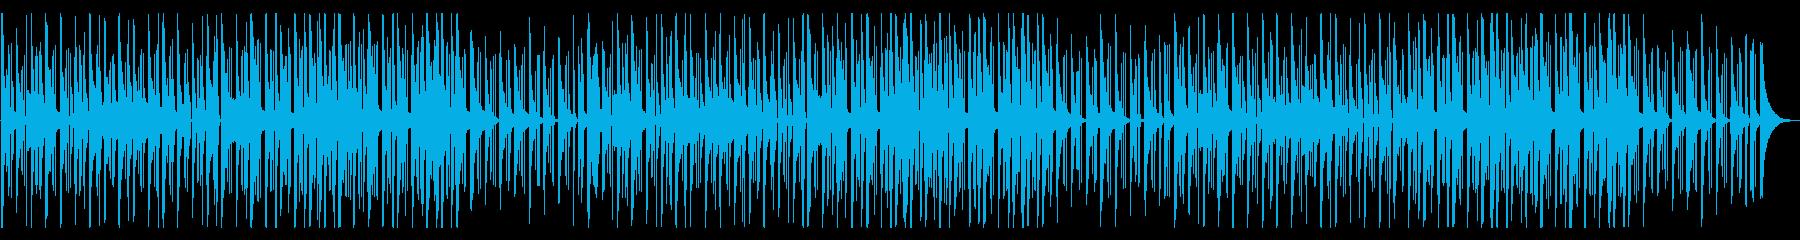 YouTube ほのぼのとした日常の再生済みの波形